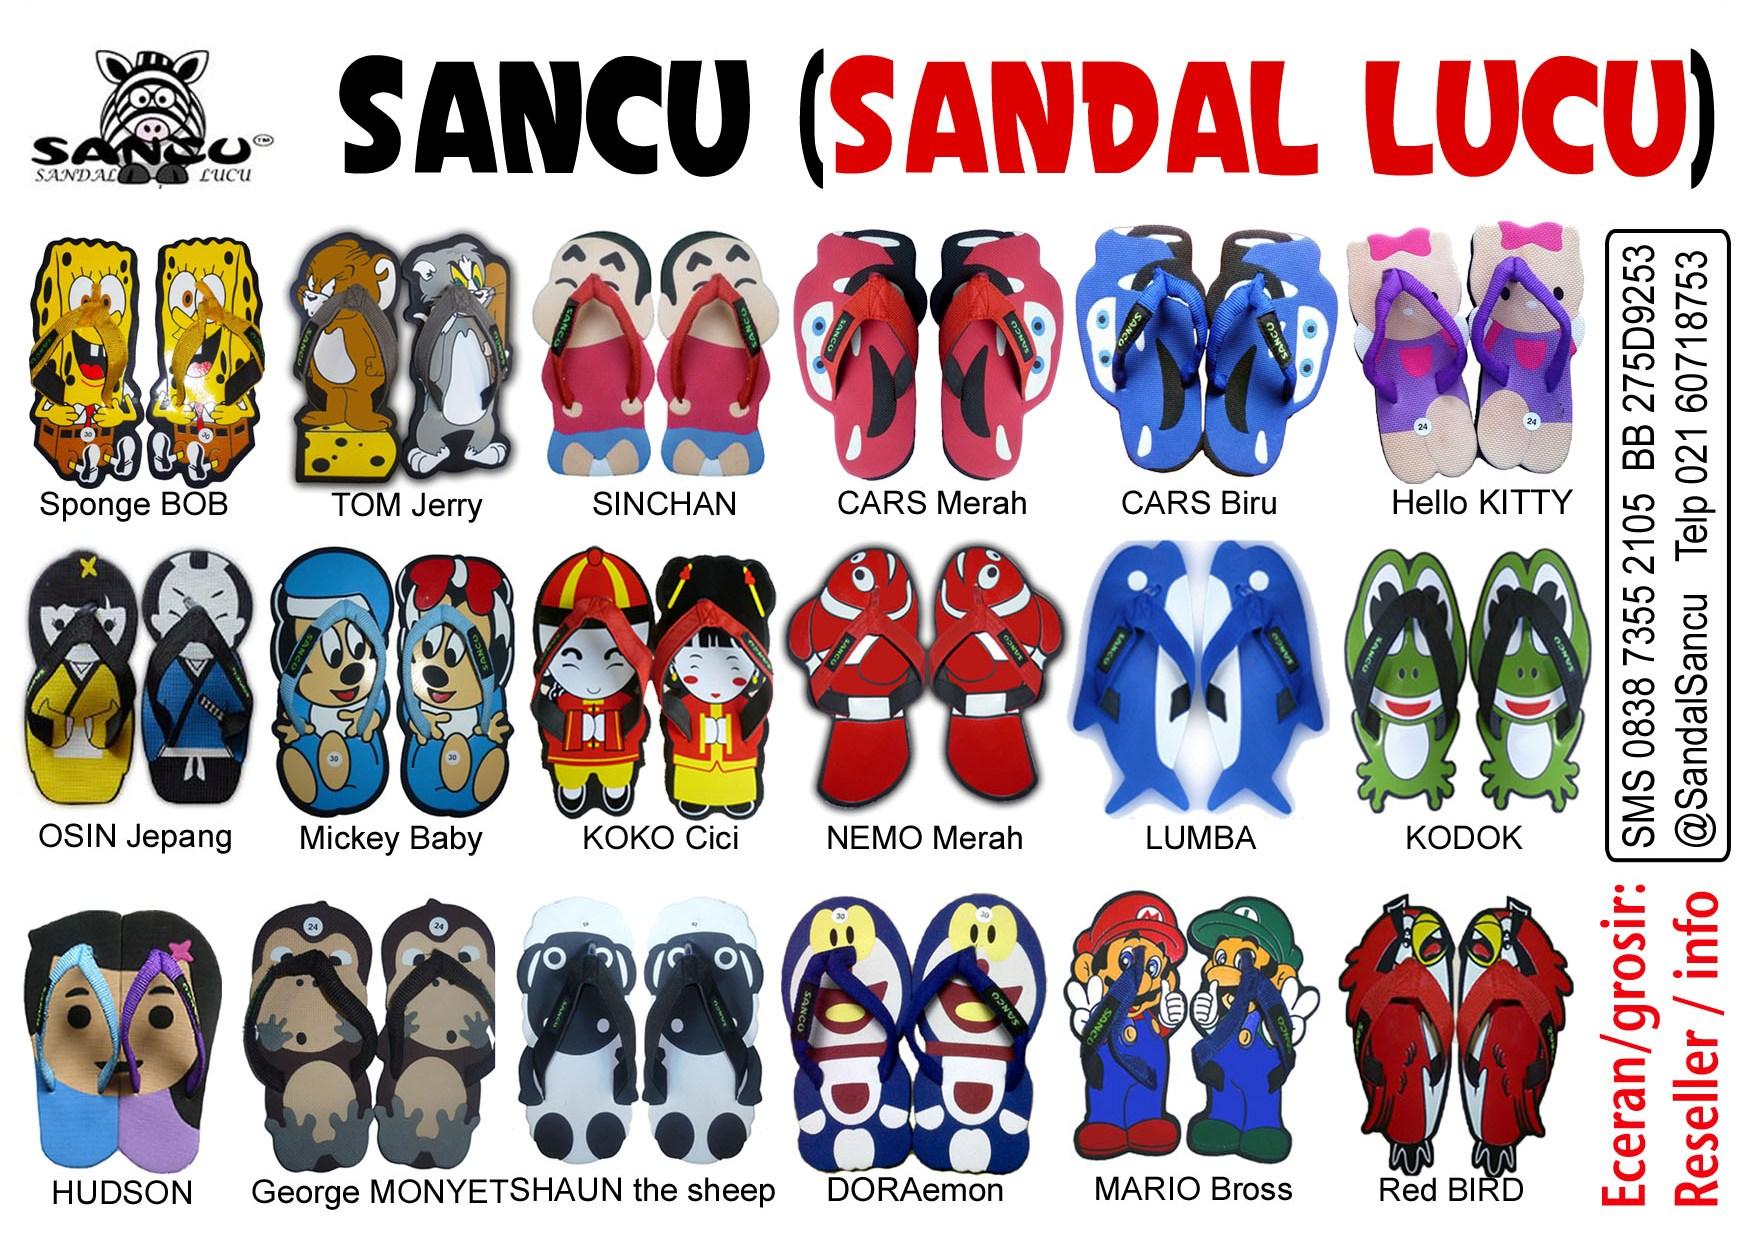 Jual Sandal Sandal Lucu Model Hudson Jual Sandal Lucu ...